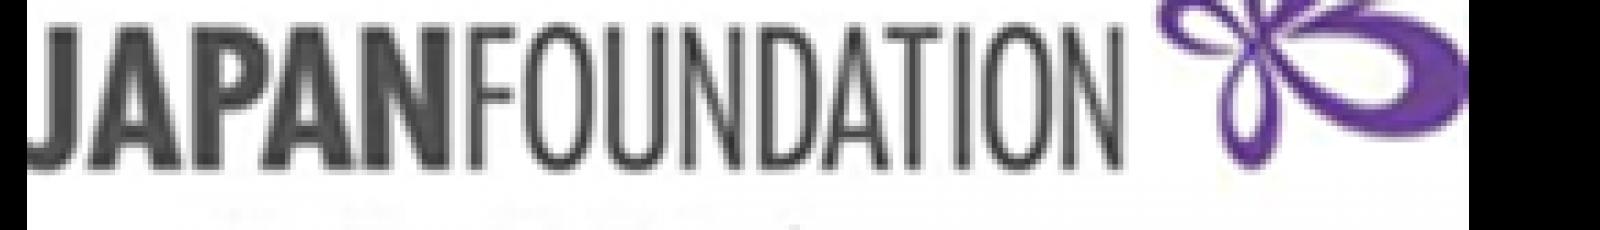 cropped-JF-logo-e1458875680774-1.png